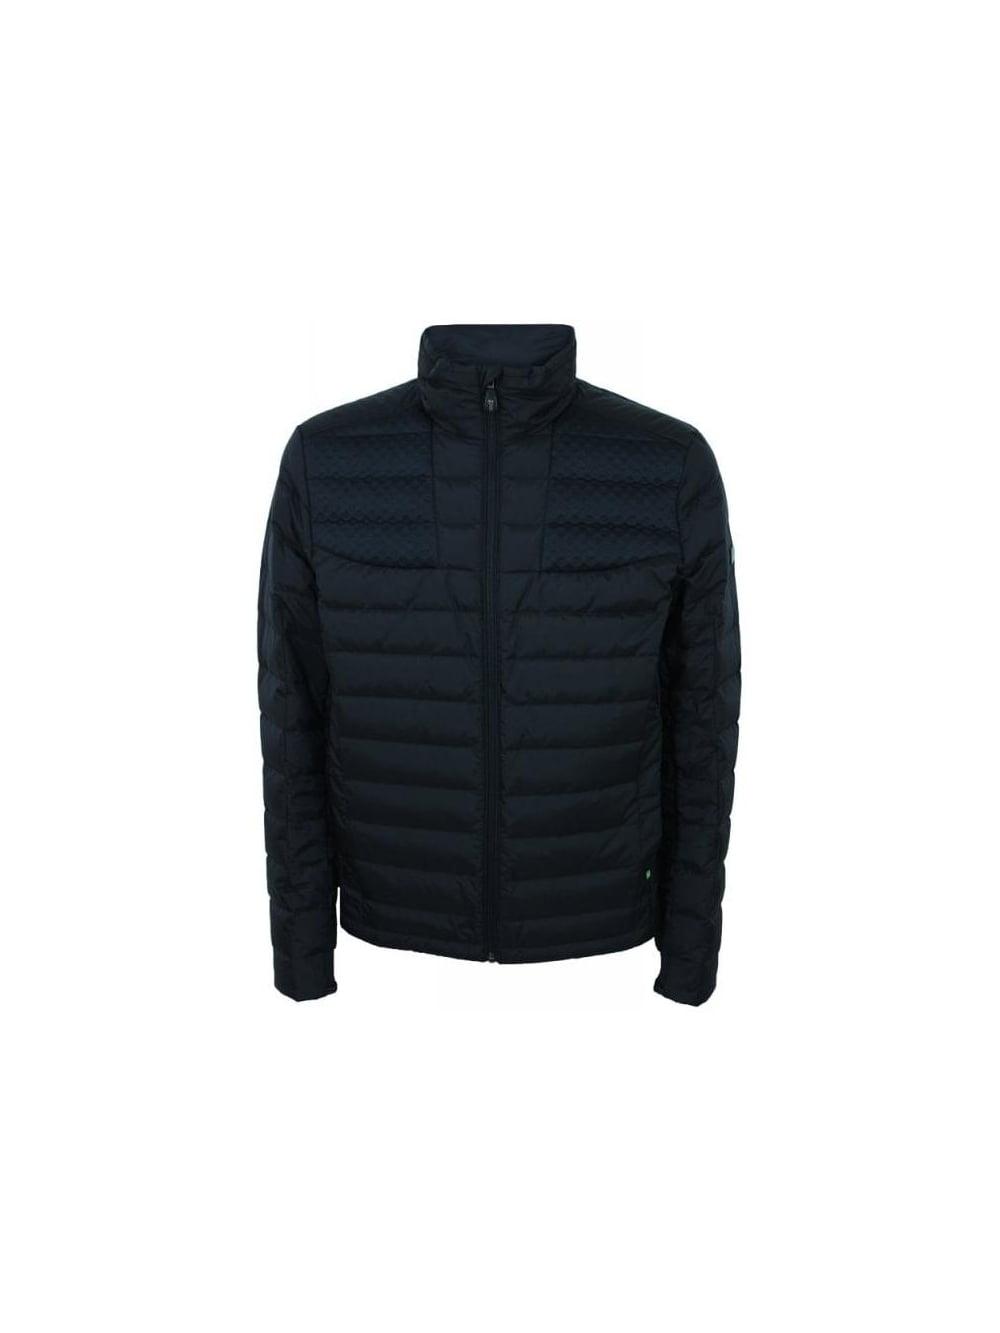 0a2f0e0936f Hugo Boss Green Jurado Jacket in Black - Northern Threads